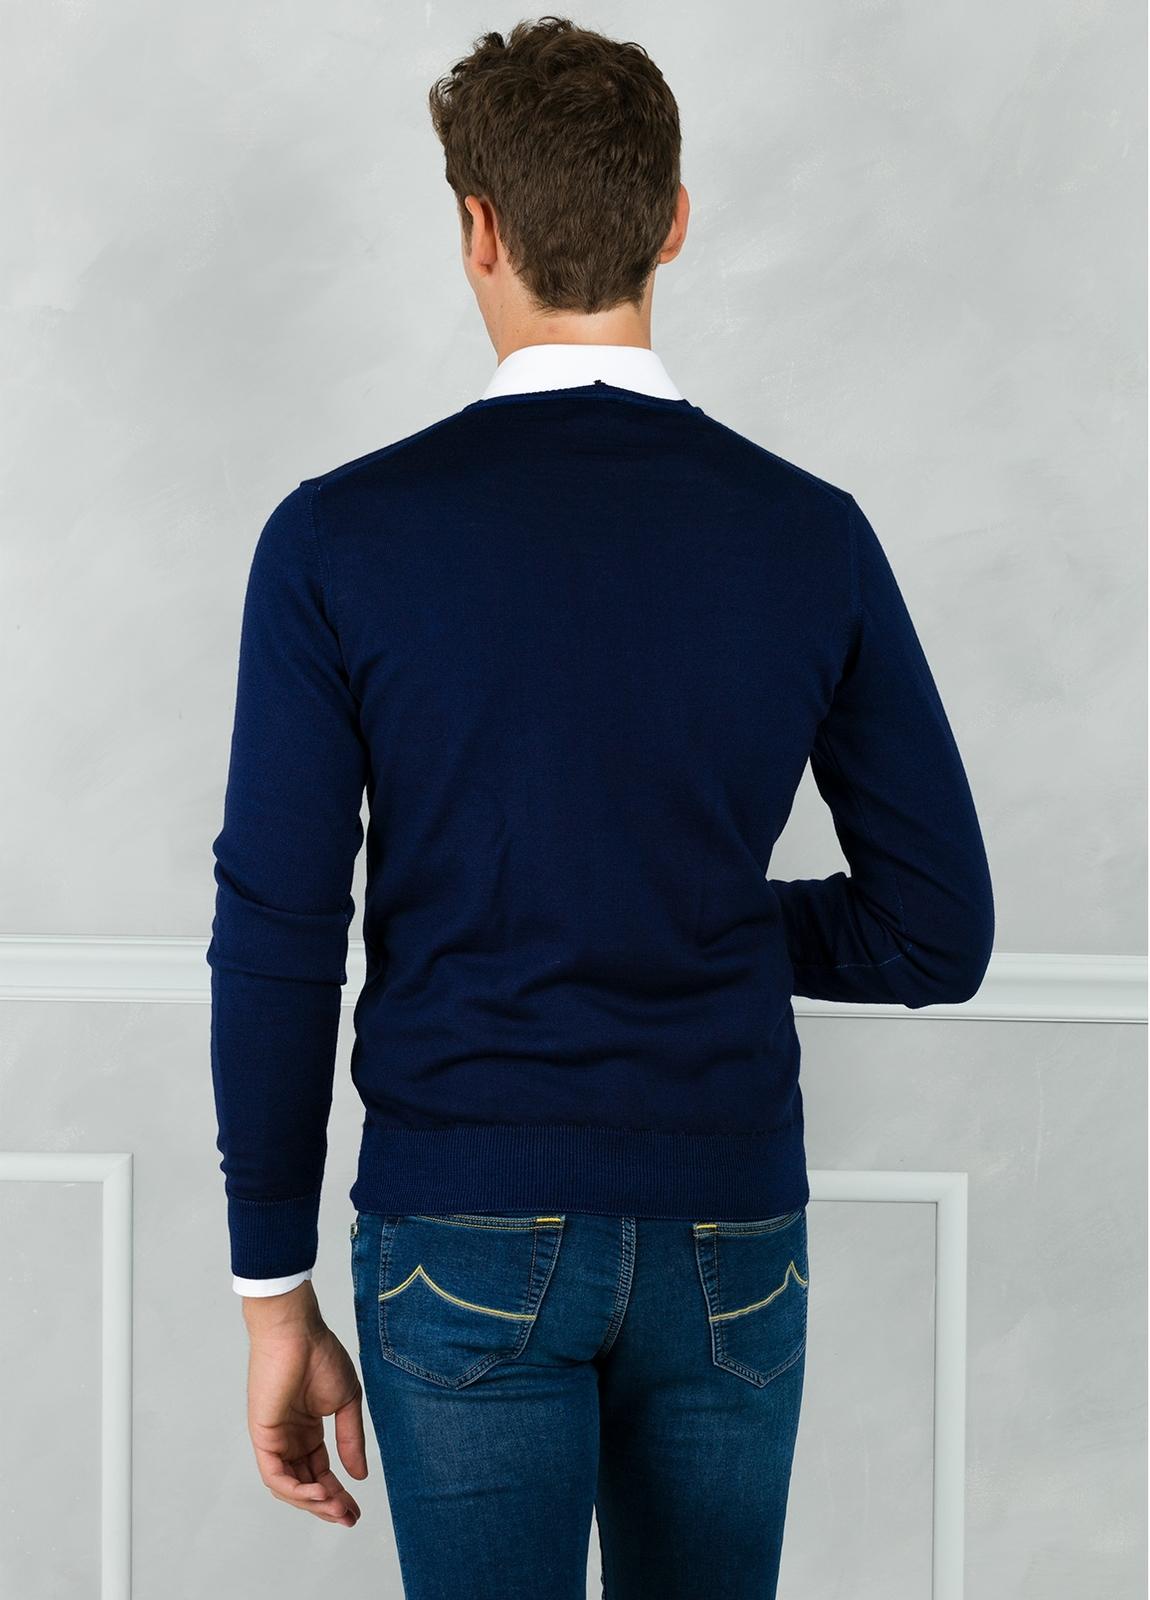 Jersey liso cuello pico, color azul tinta. 100% Lana merino. - Ítem1